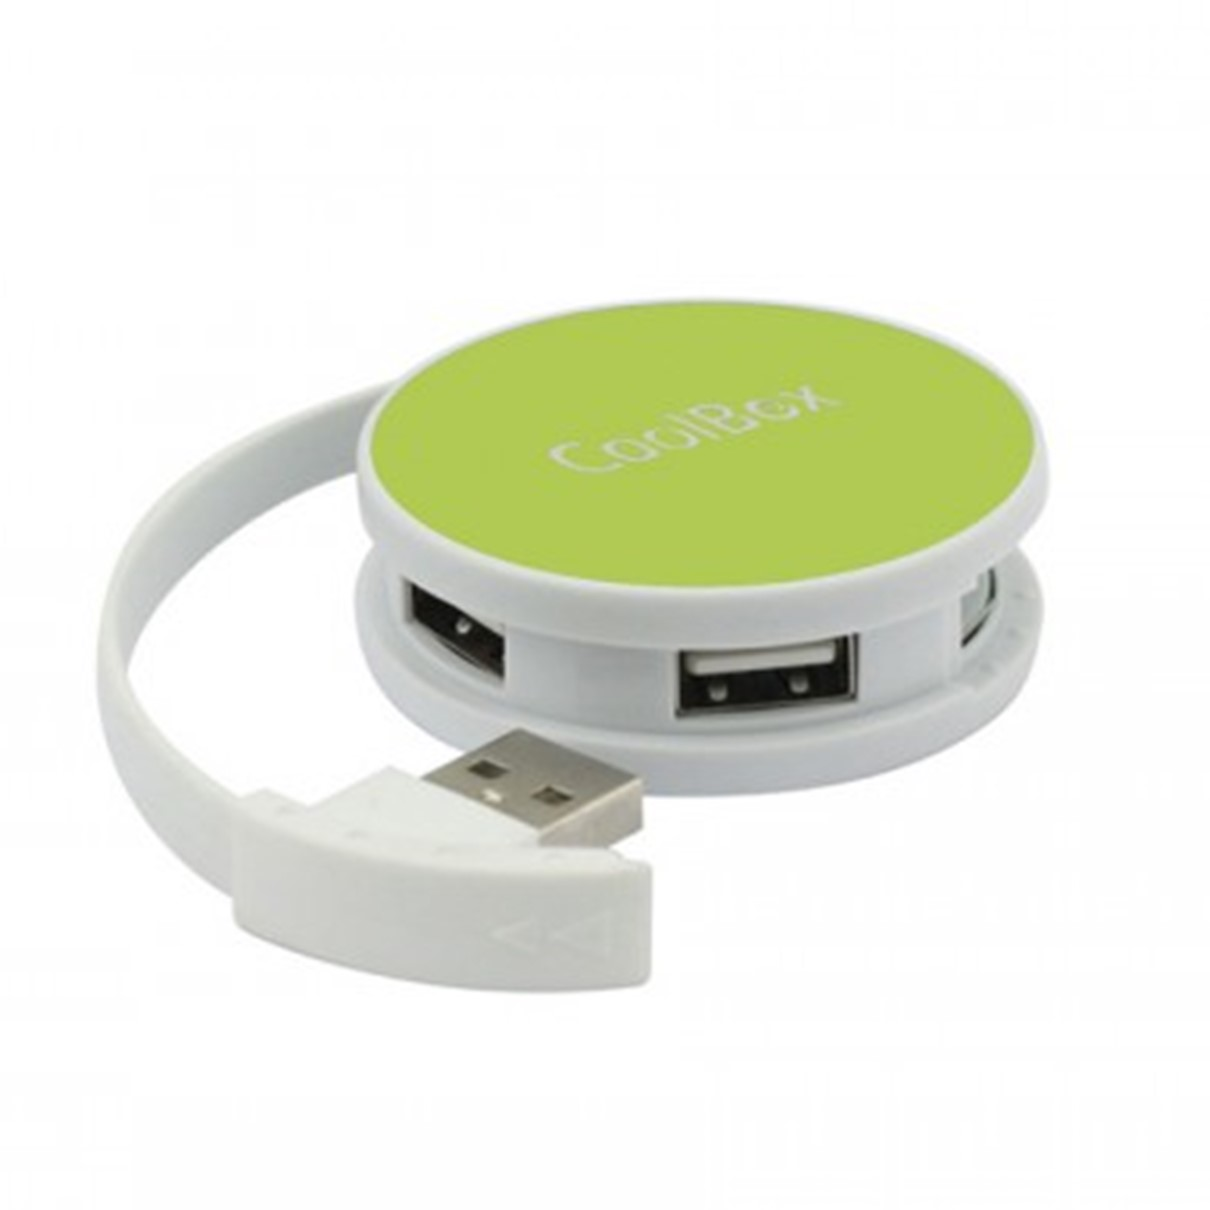 HUB COOLBOX 4 PUERTOS USB 2.0 COMPACTO VERDE